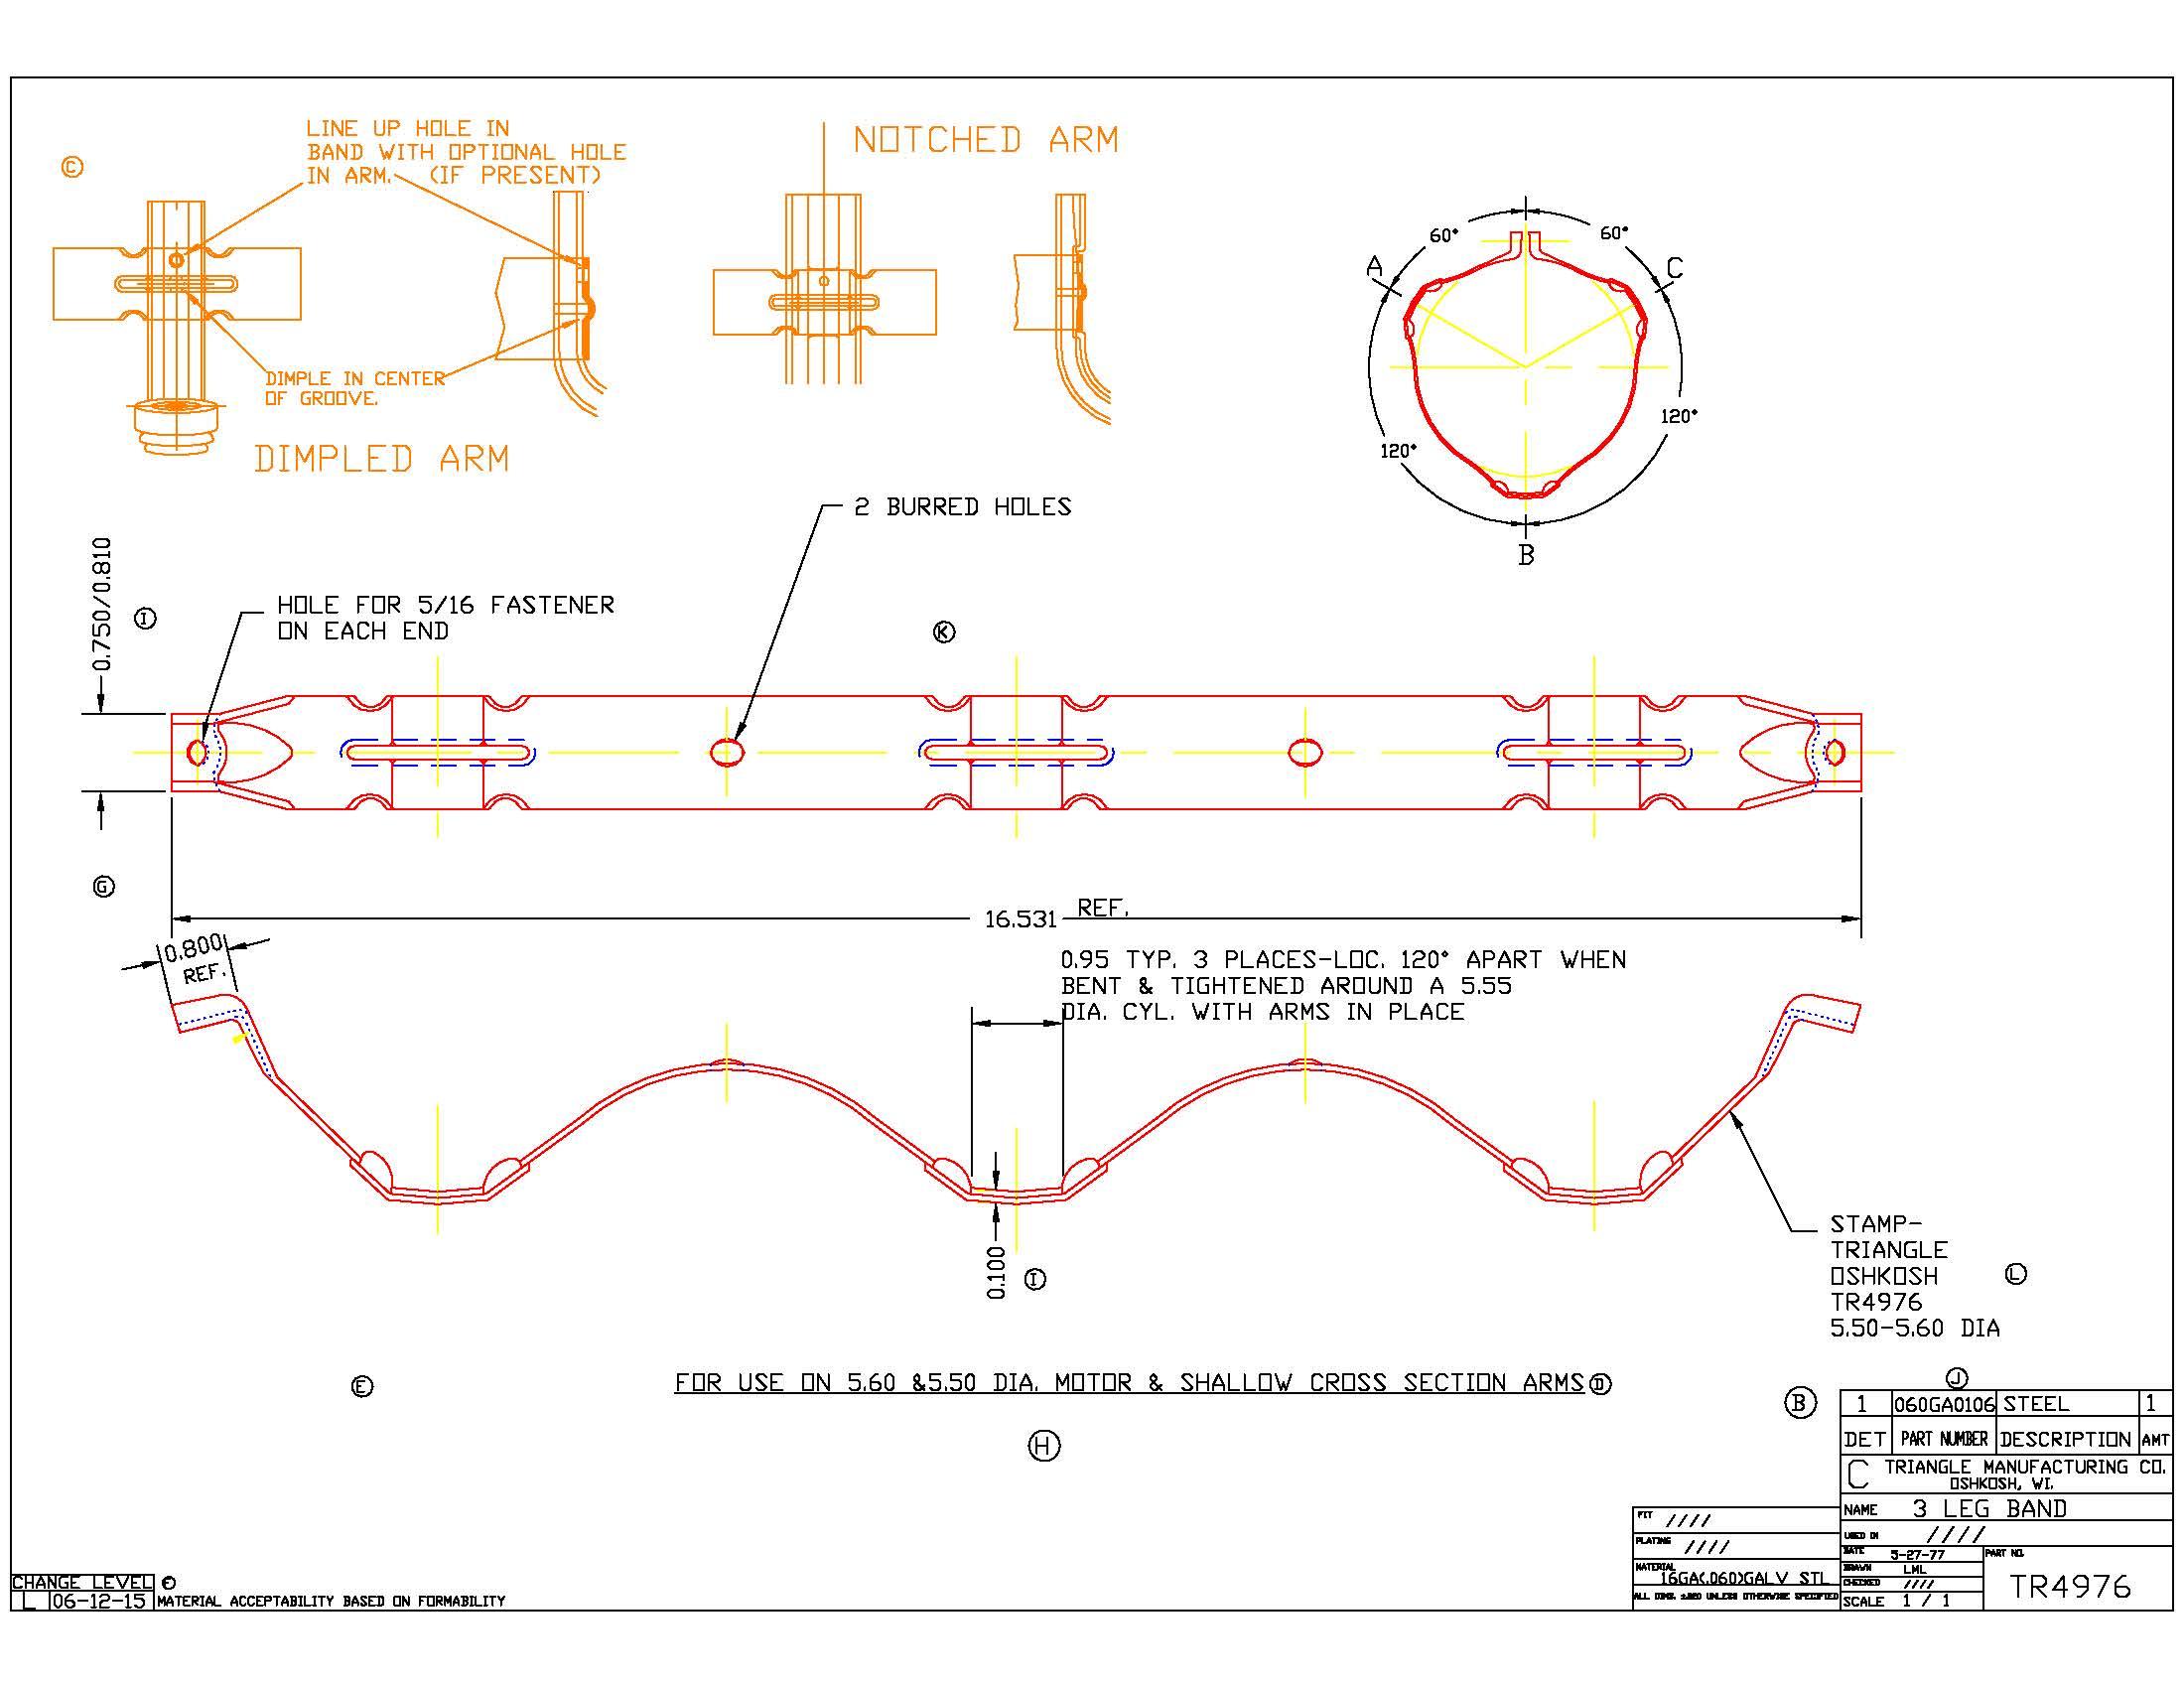 Motor Mount Band TR4976